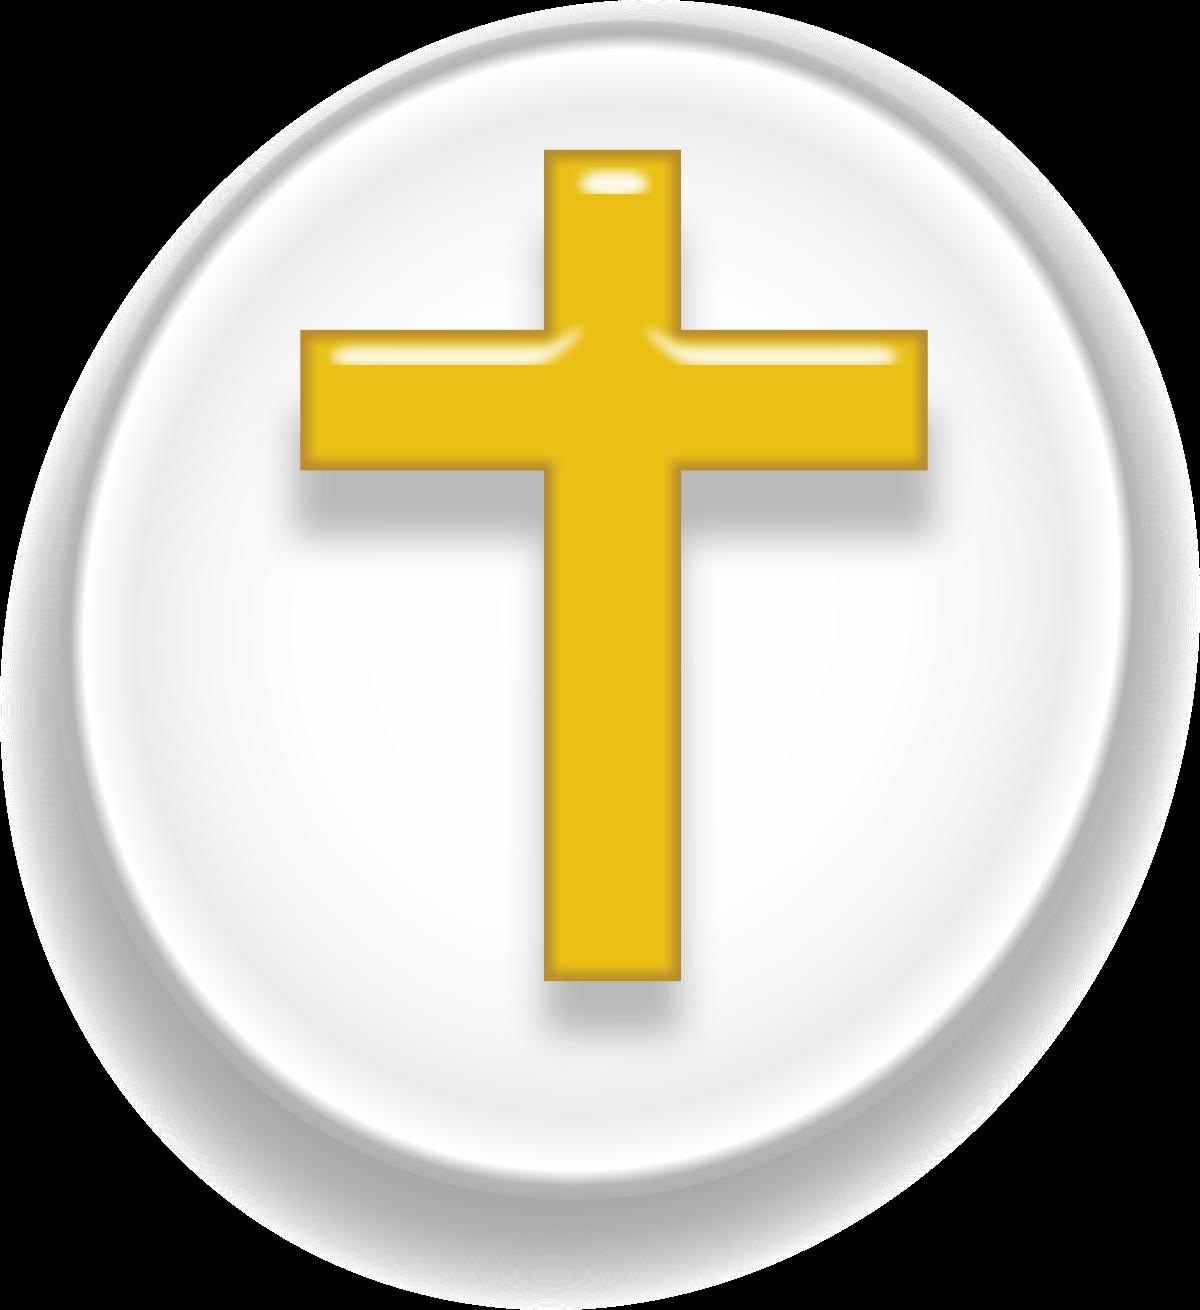 Cristo jesus dios religion catolicos svg clipart svg transparent download Cristianismo - Wikipedia, la enciclopedia libre svg transparent download